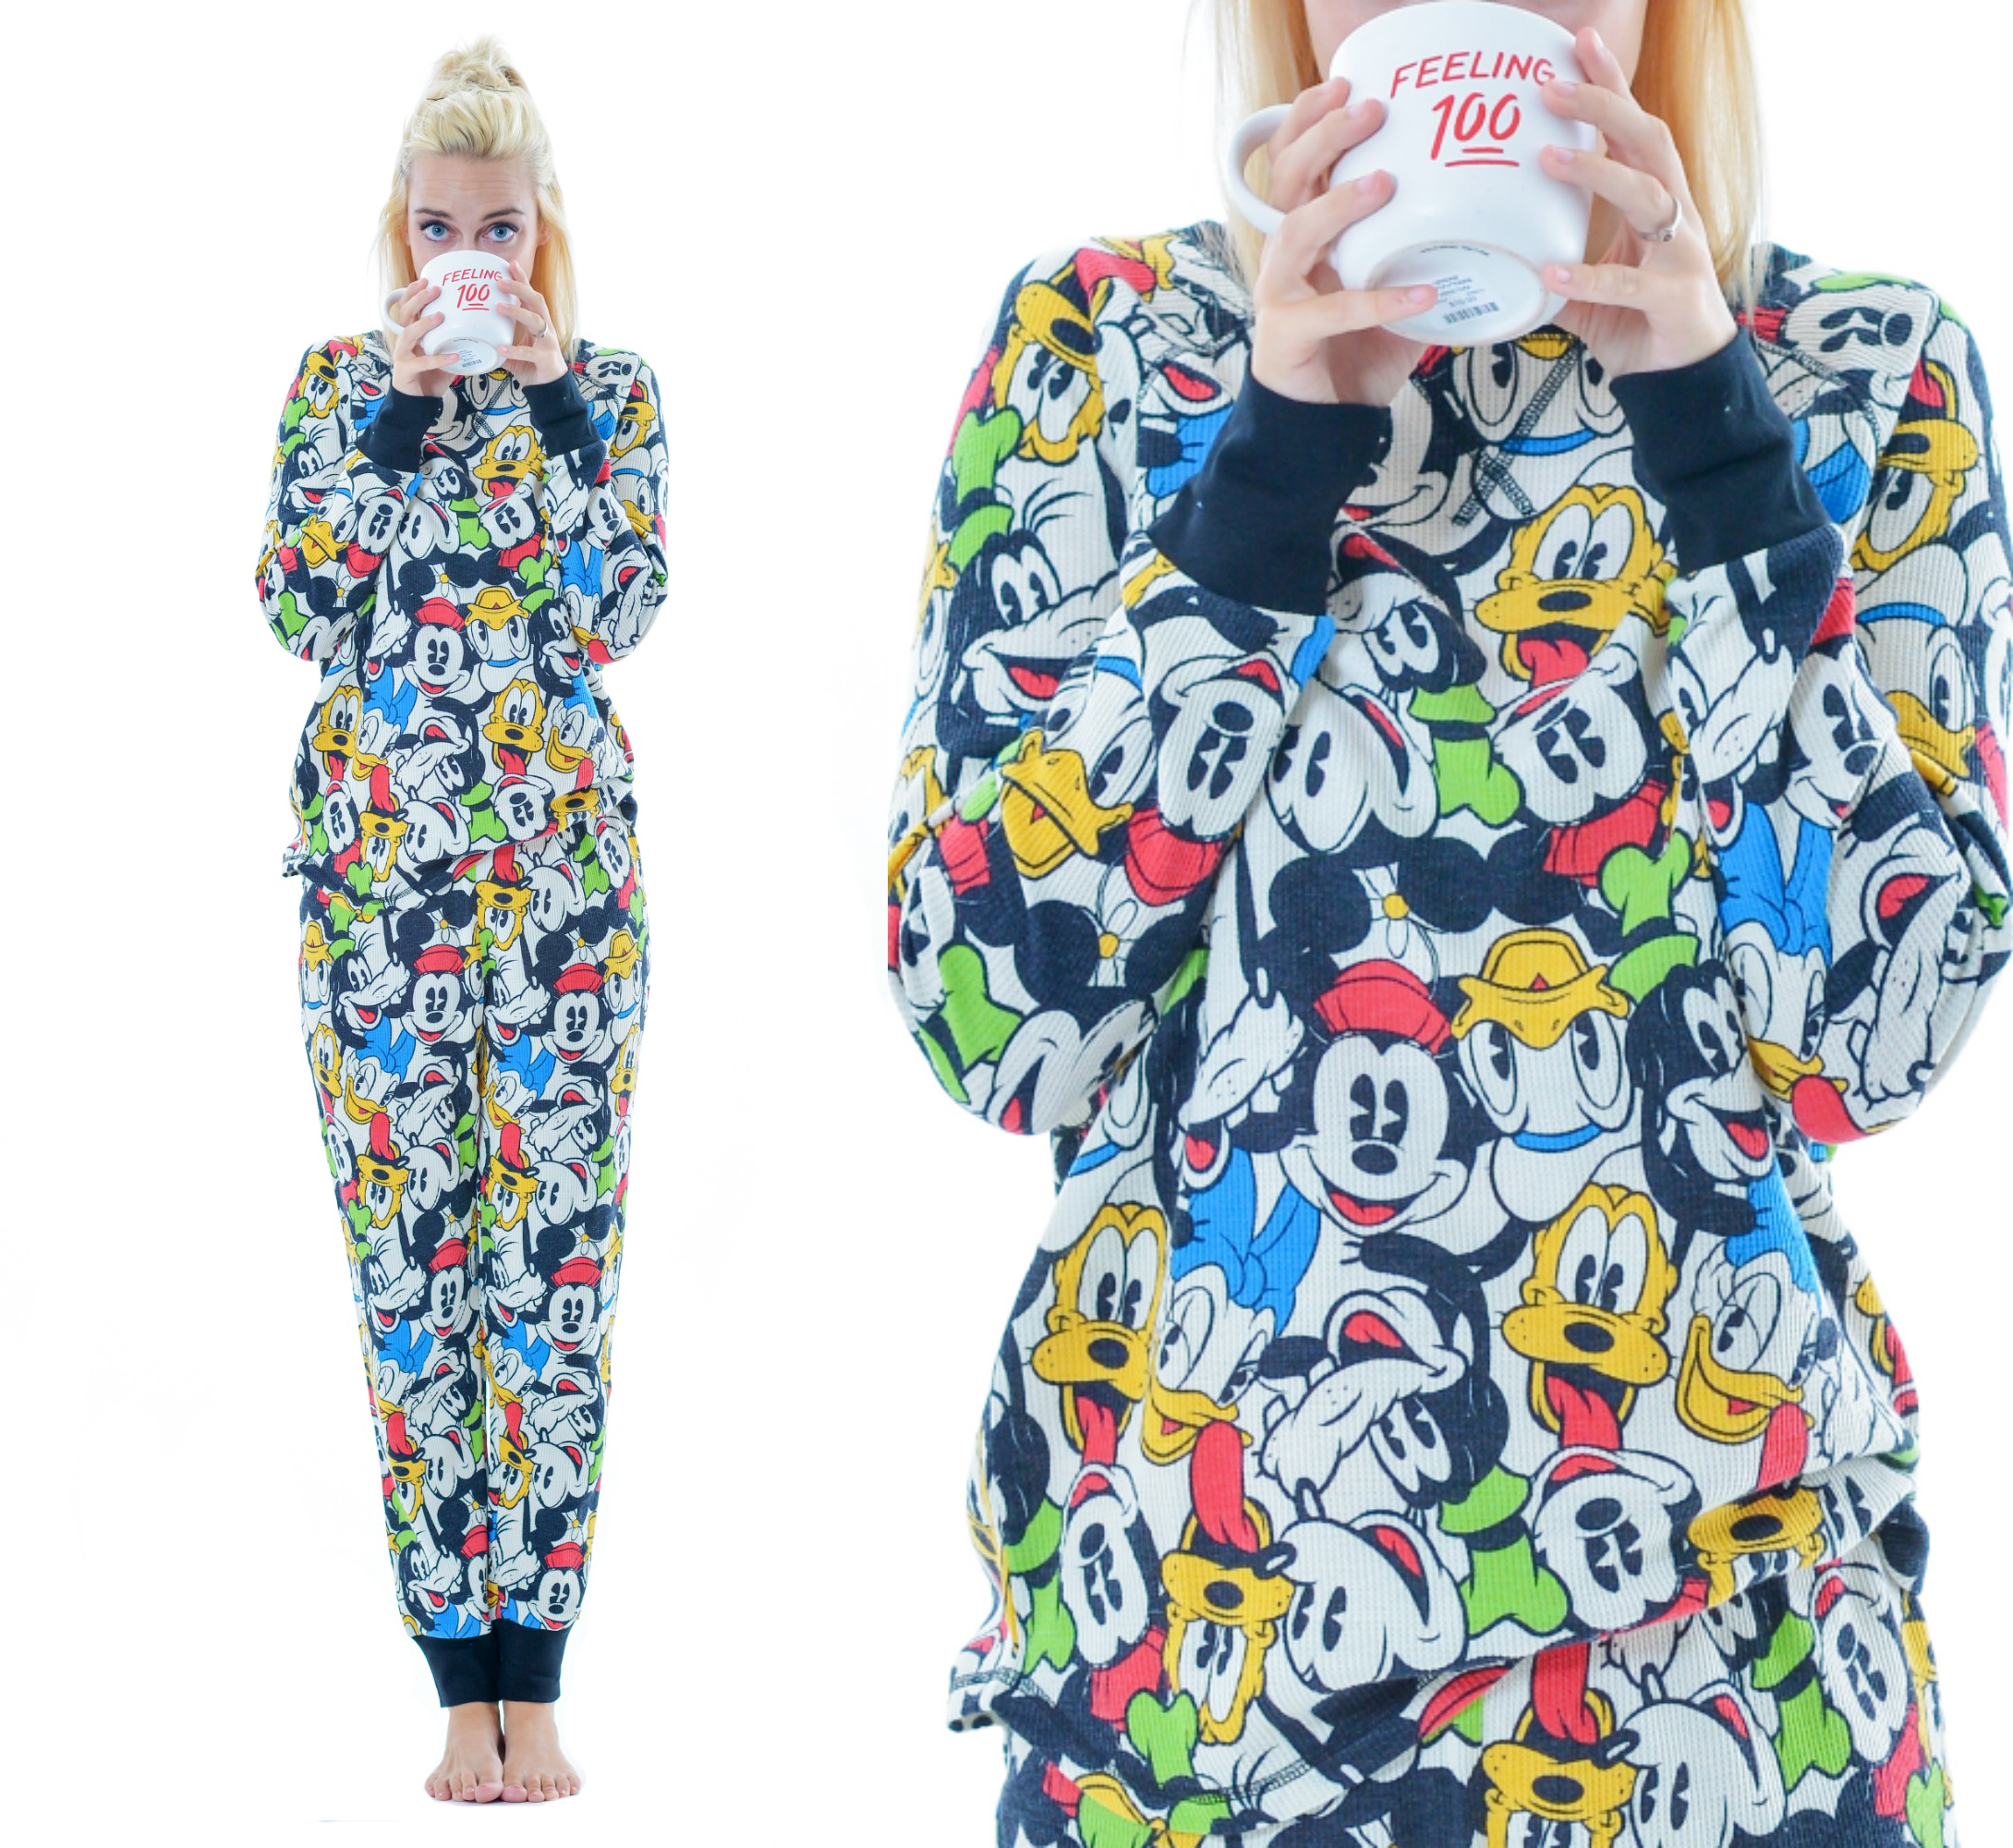 women hatley comfortable clothing dp pajamas s comforter glamping store amazon womens pj at bottoms